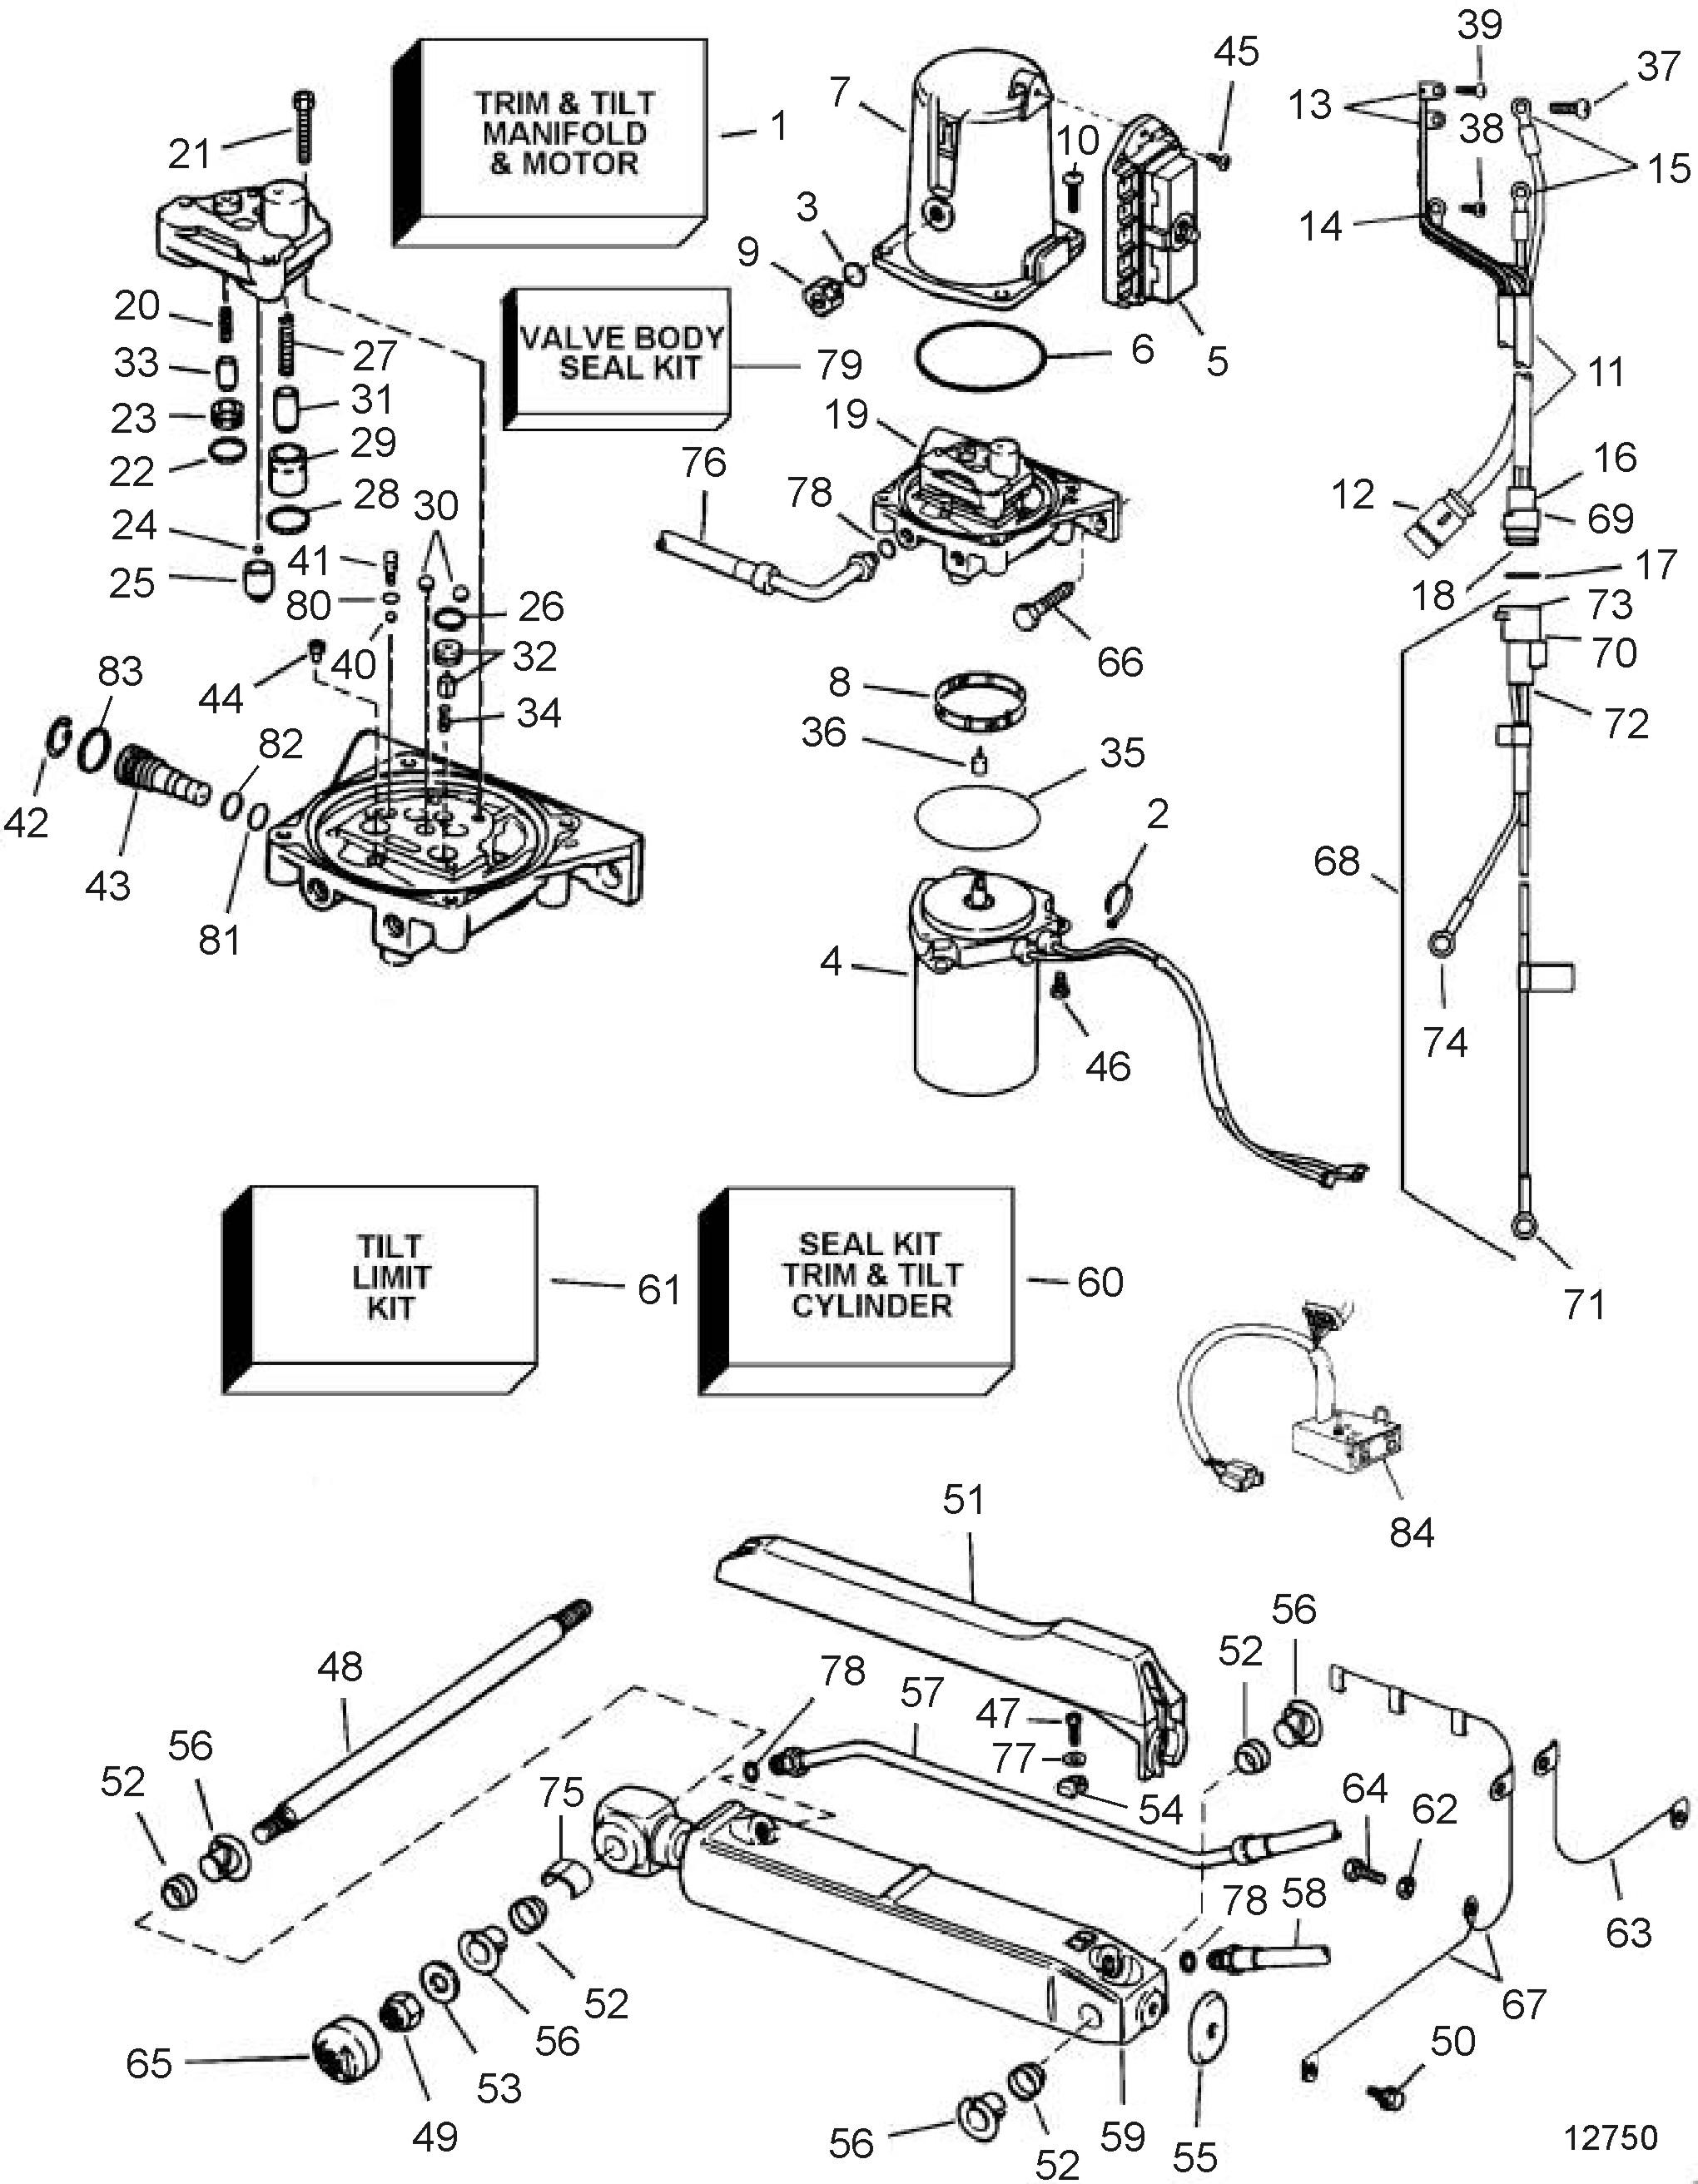 MW_7268] Volvo Penta 270 Trim Wiring Diagram Wiring Diagram | Volvo Penta Trim Gauge Wiring Diagram |  | Astic Anist Xolia Mohammedshrine Librar Wiring 101